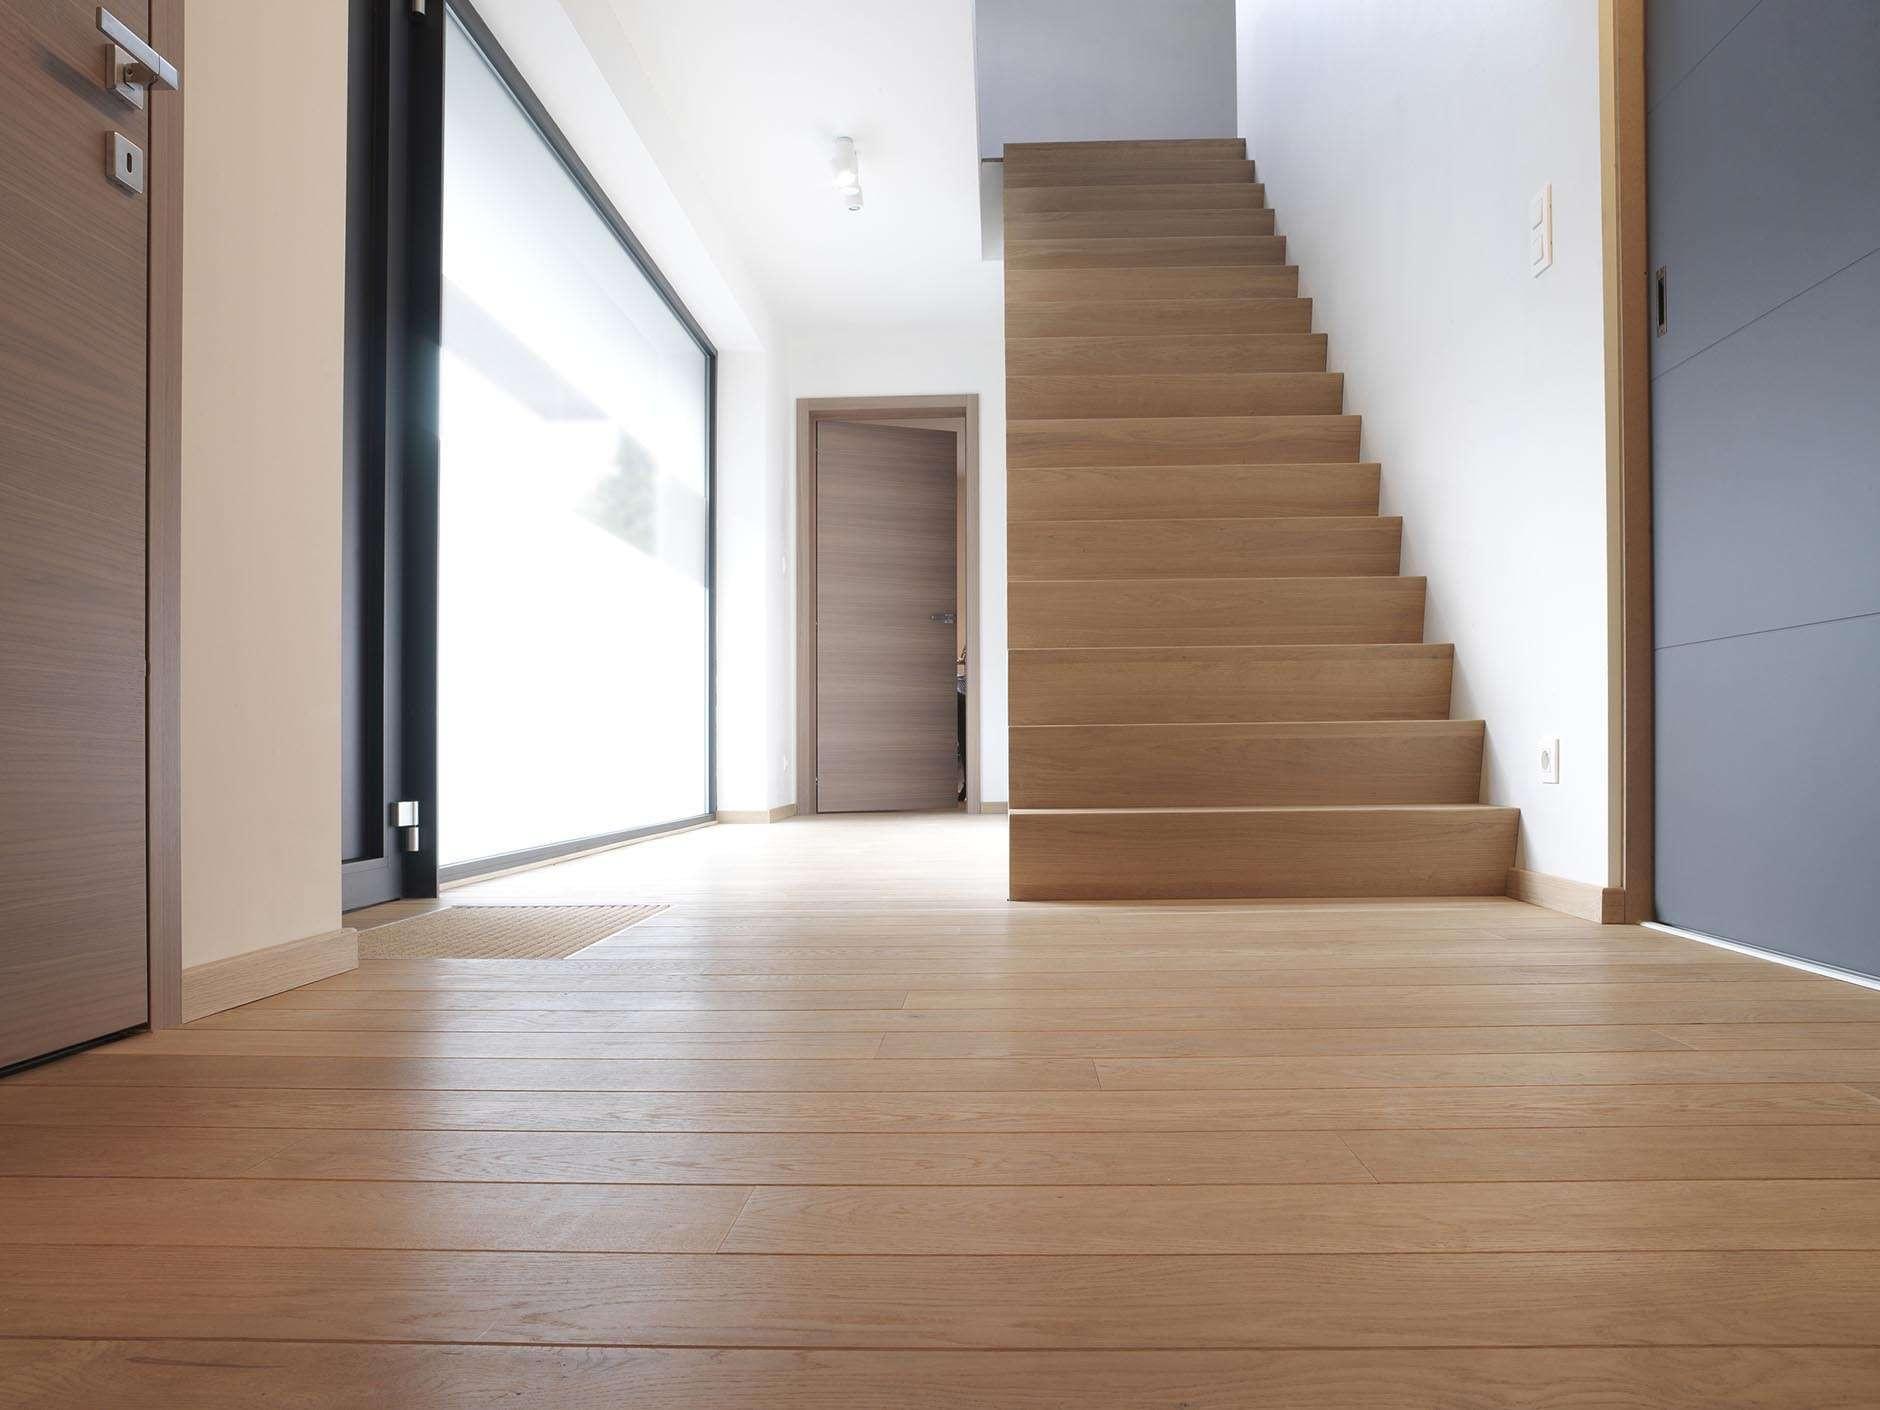 houten-Z-trap-modern-interieur